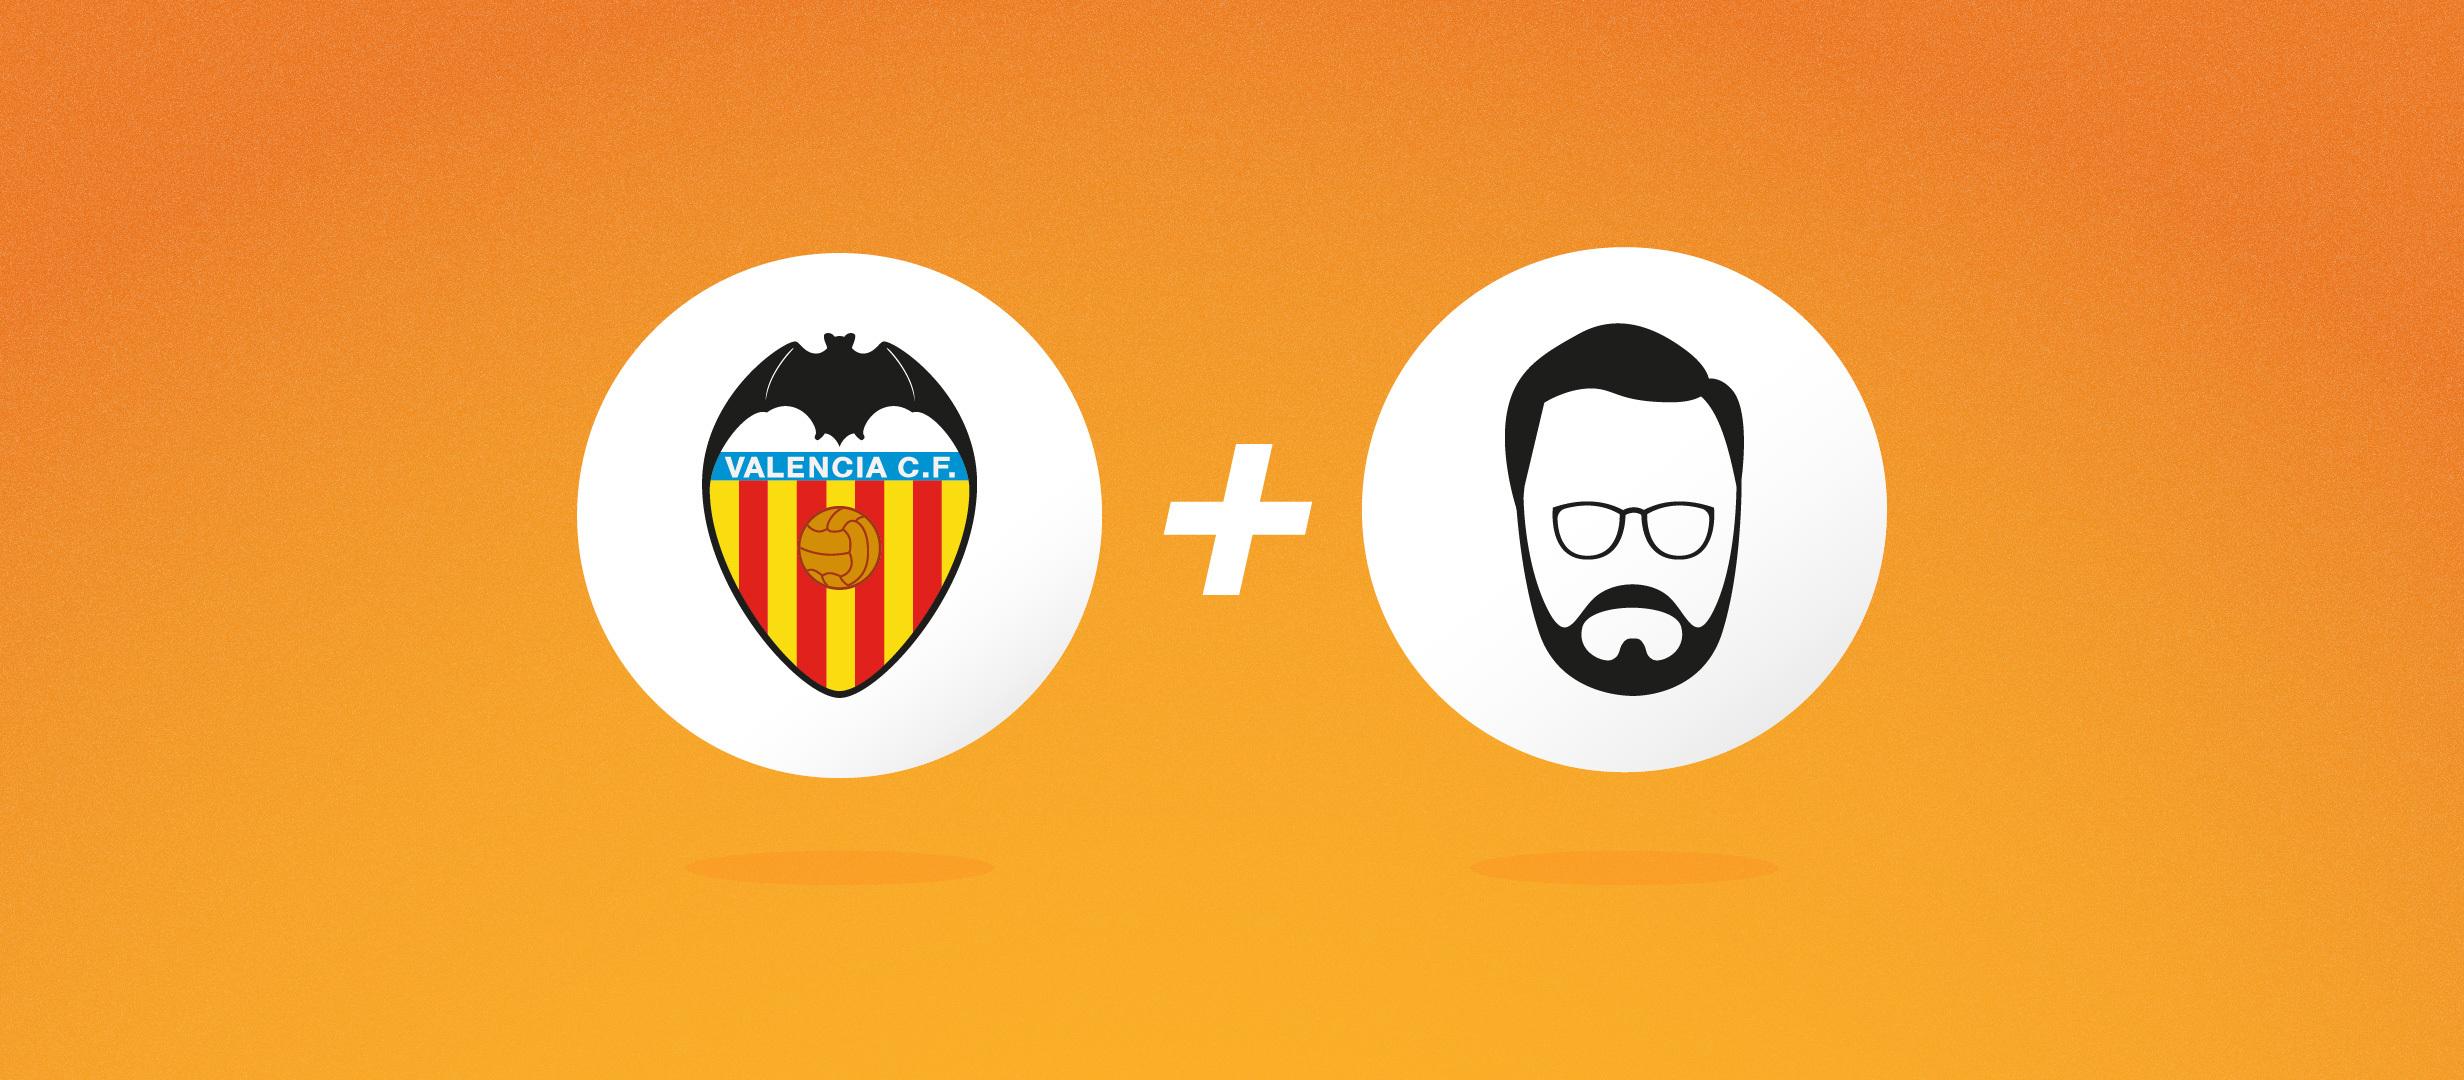 Команда-загадка: перспективы «Валенсии» на основе статистики Пепа Бордаласа